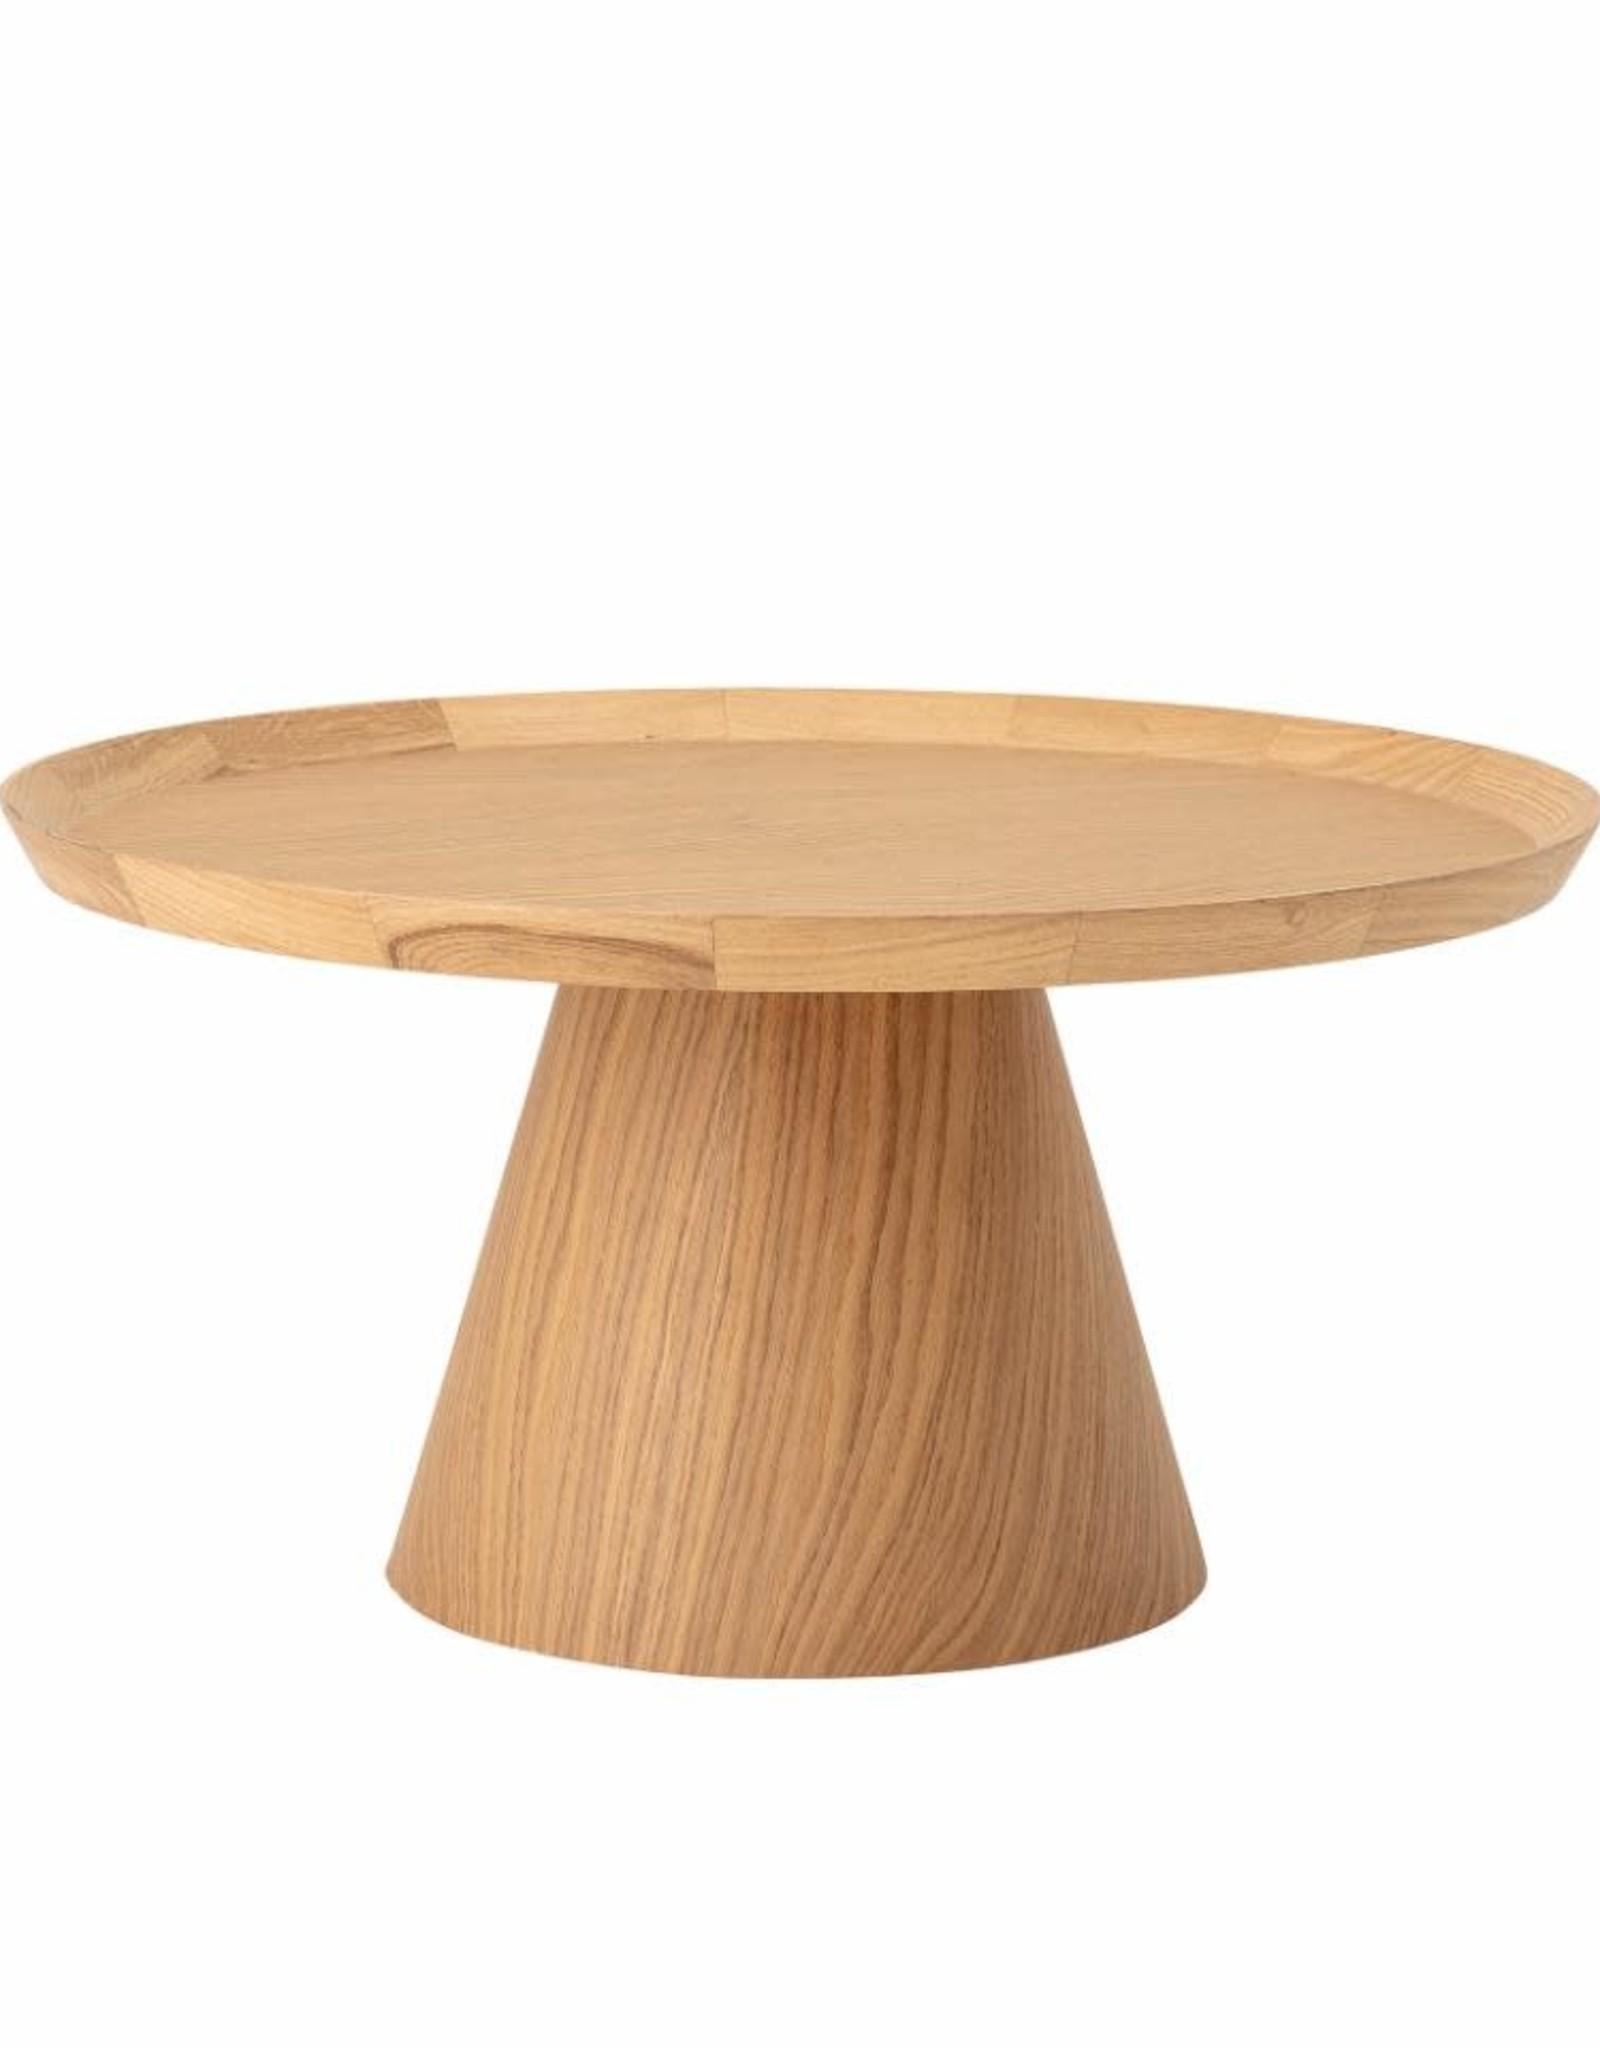 Bloomingville Bloomingville  - Luana Coffee table